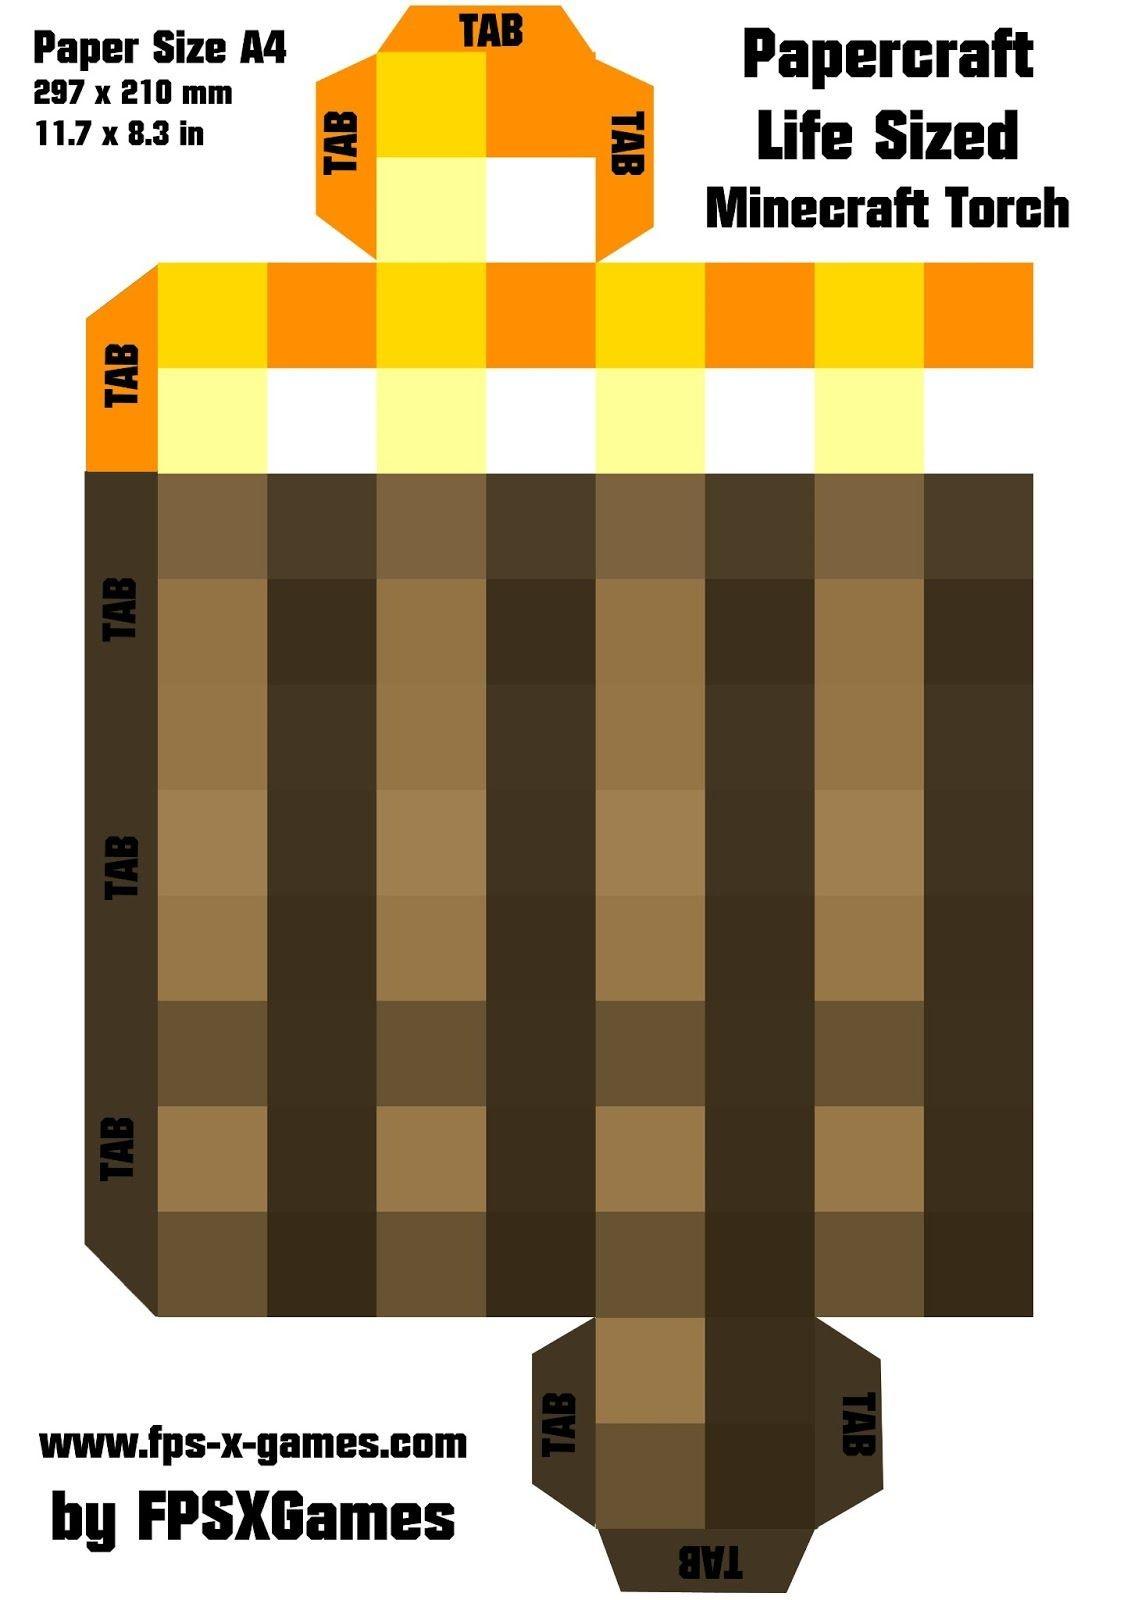 Minecraft Papercraft Sets Artesanato De Minecraft Passo A Passo – tocha Molde